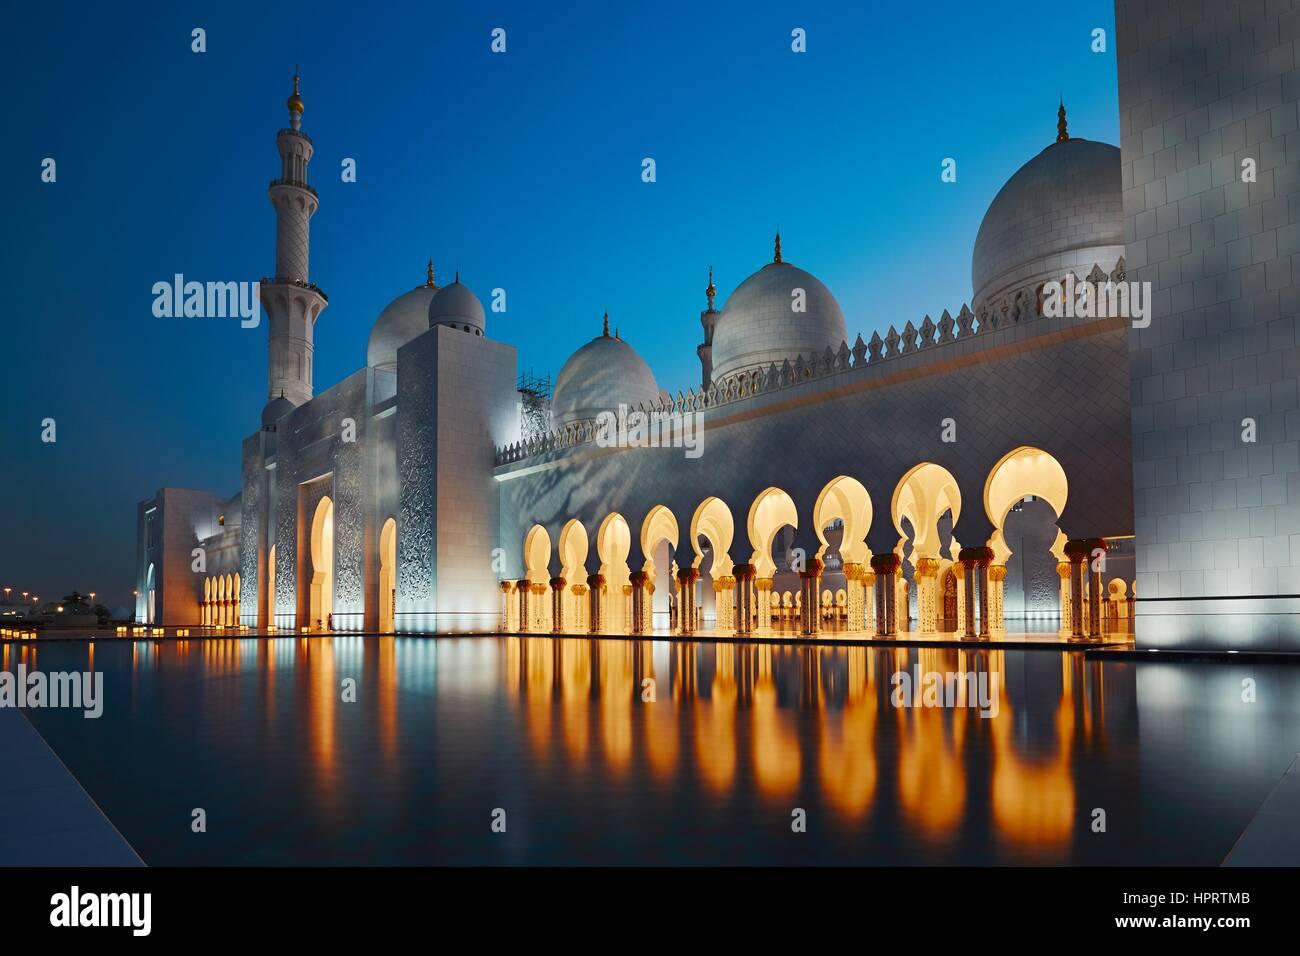 Mezquita de Abu Dhabi, la capital de los Emiratos Árabes Unidos Imagen De Stock